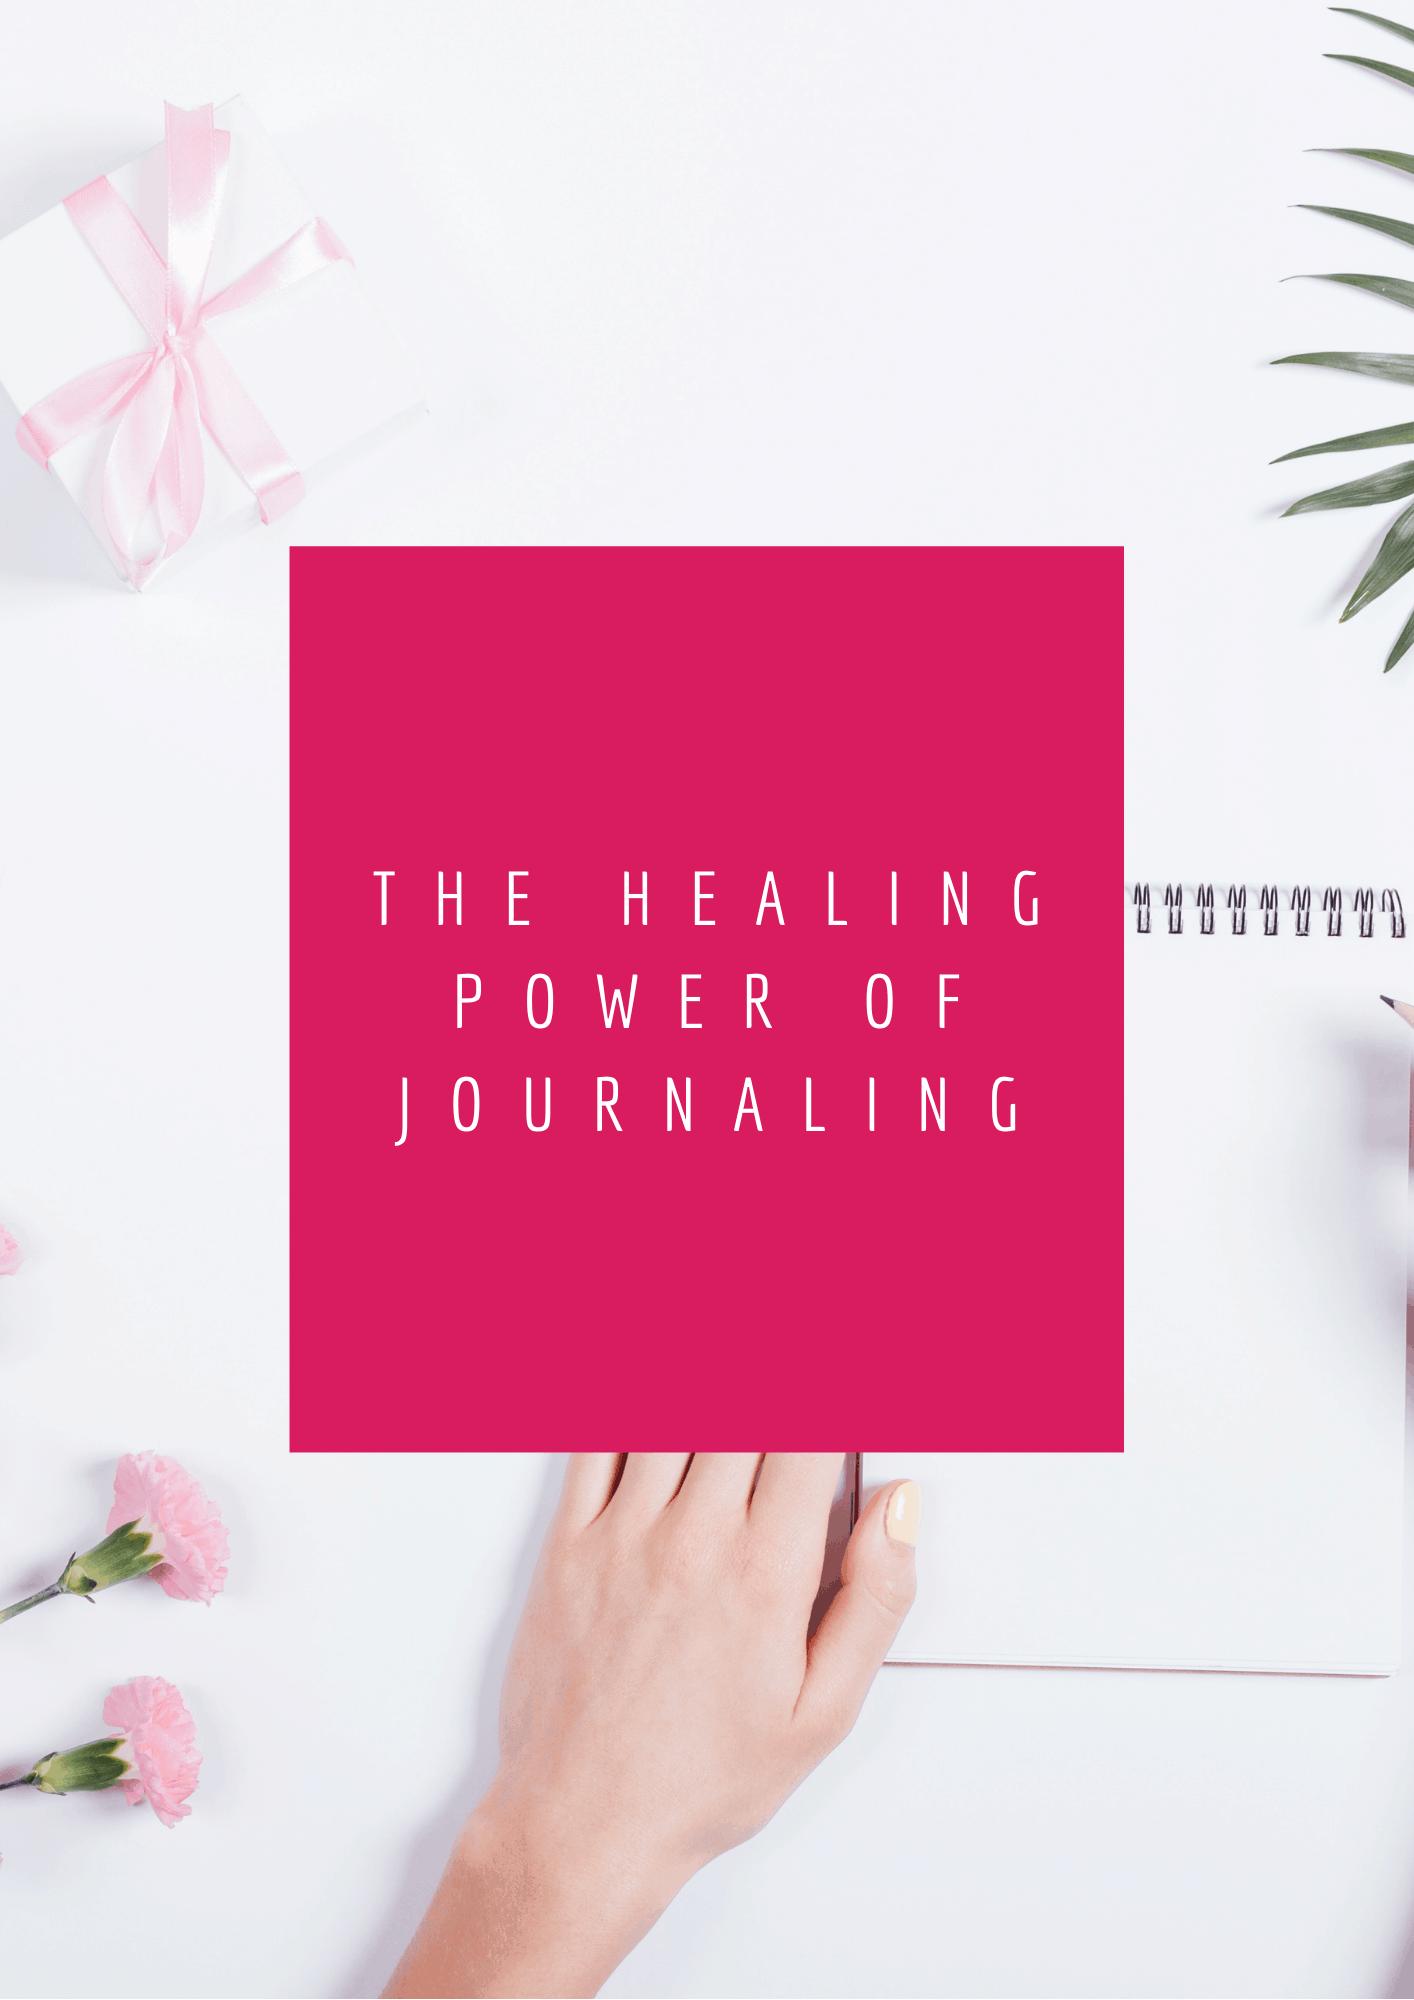 https://daledarley.com/wp-content/uploads/2021/06/The-healing-power-of-journaling.pdf